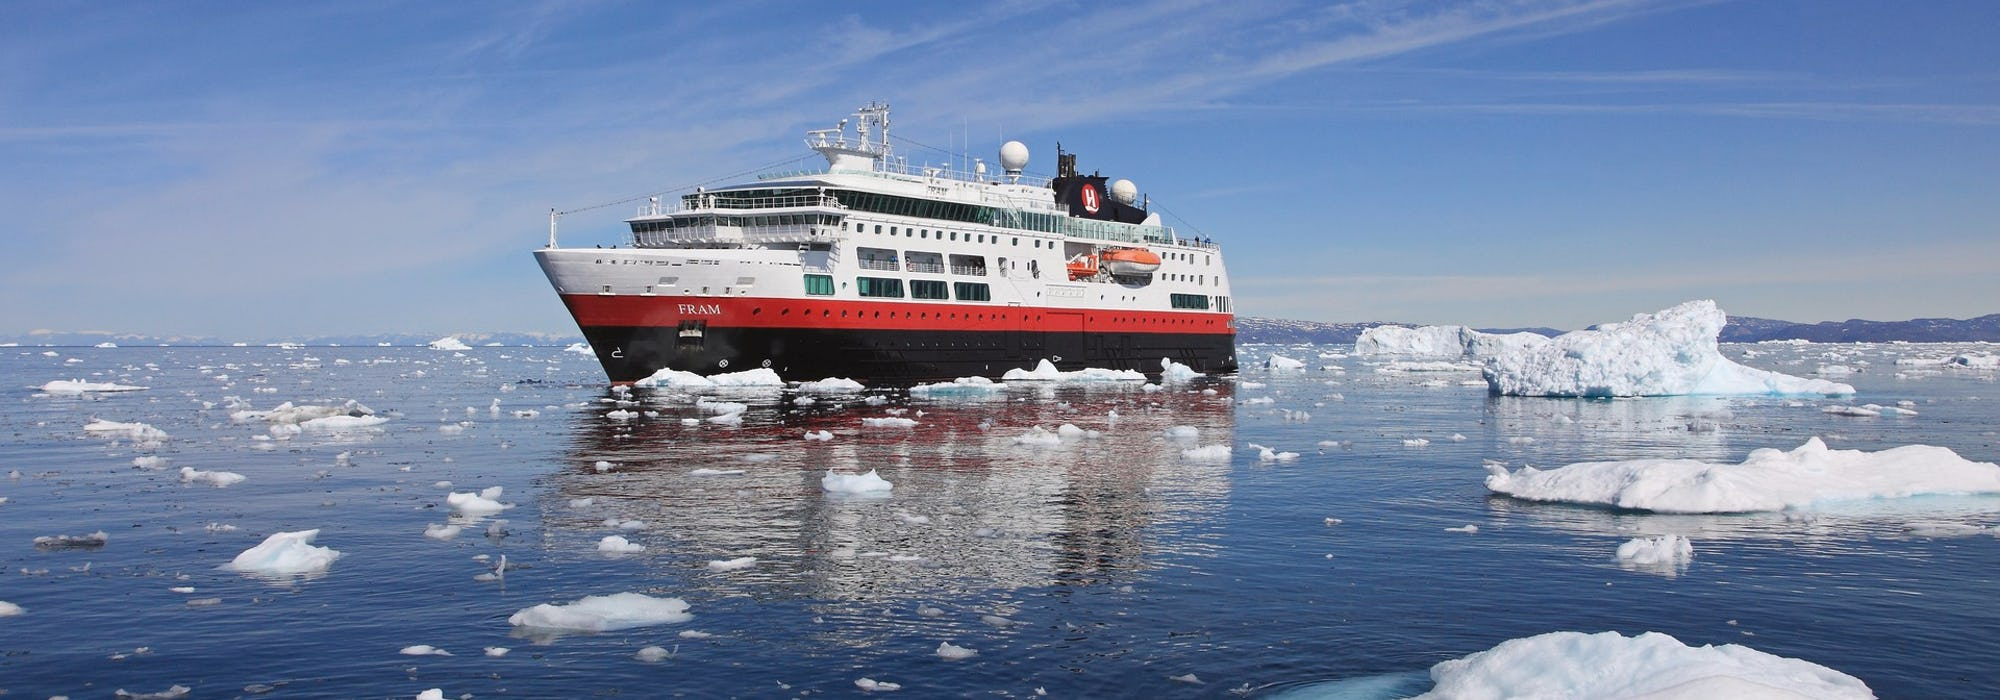 Fartyget MS Fram kryssar fram mellan de små isbergen.